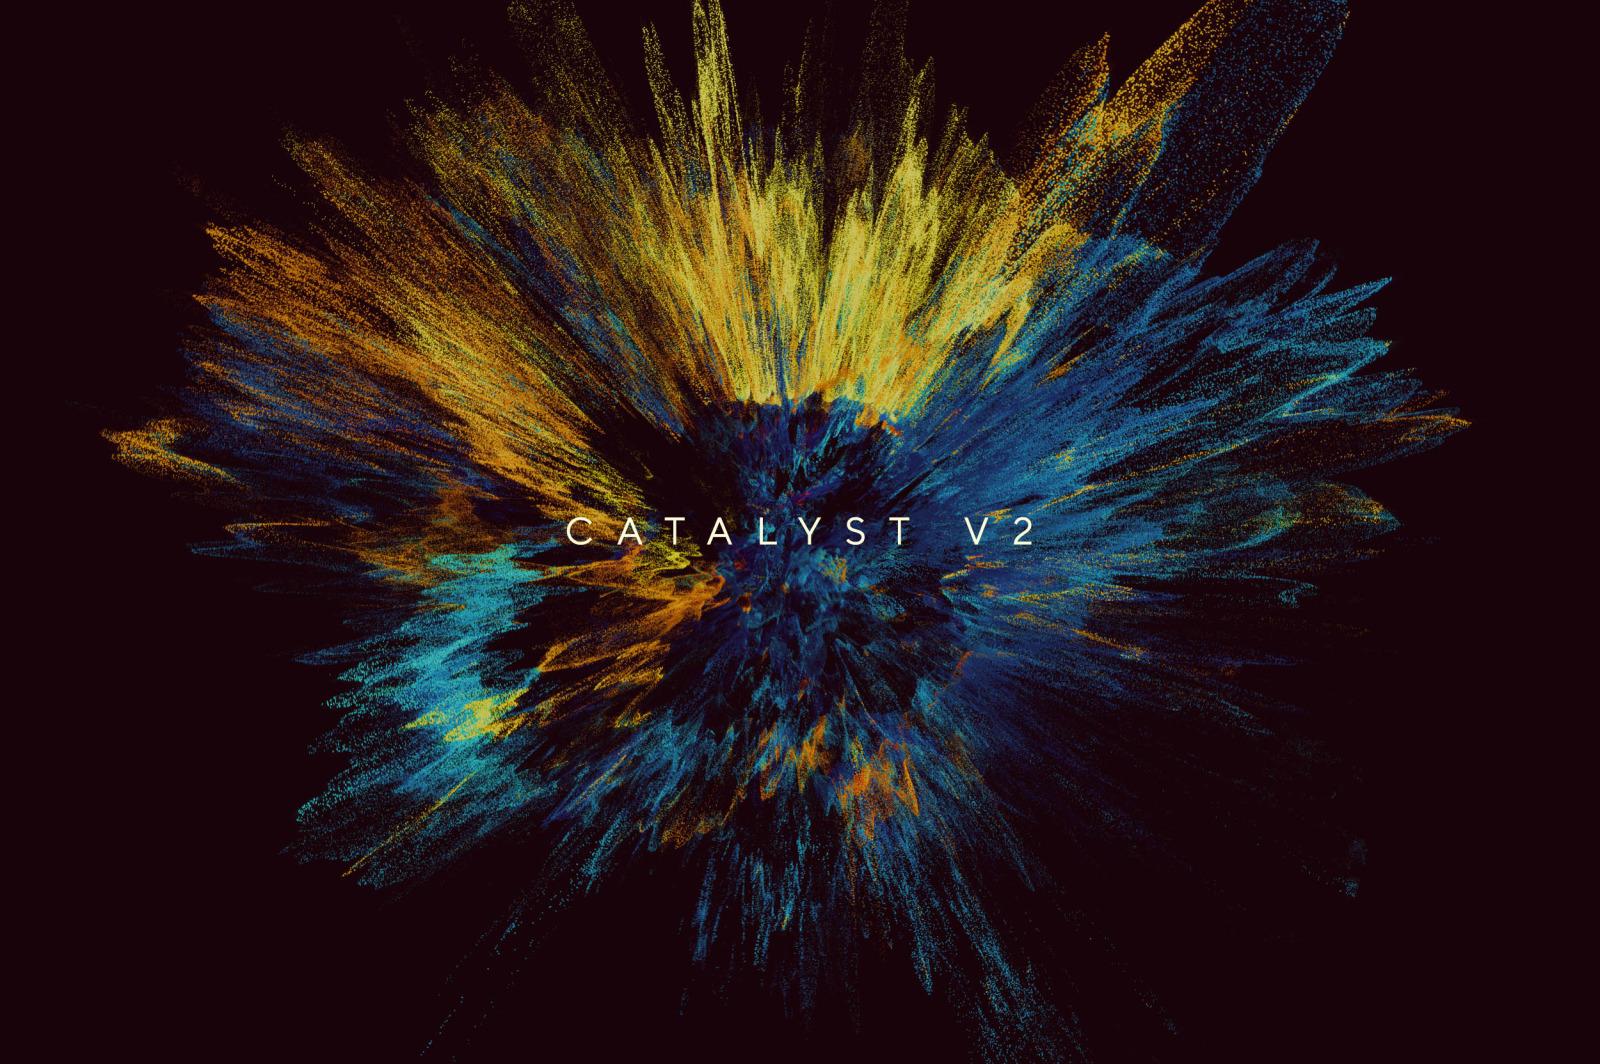 Catalyst v2: Explosive Textures